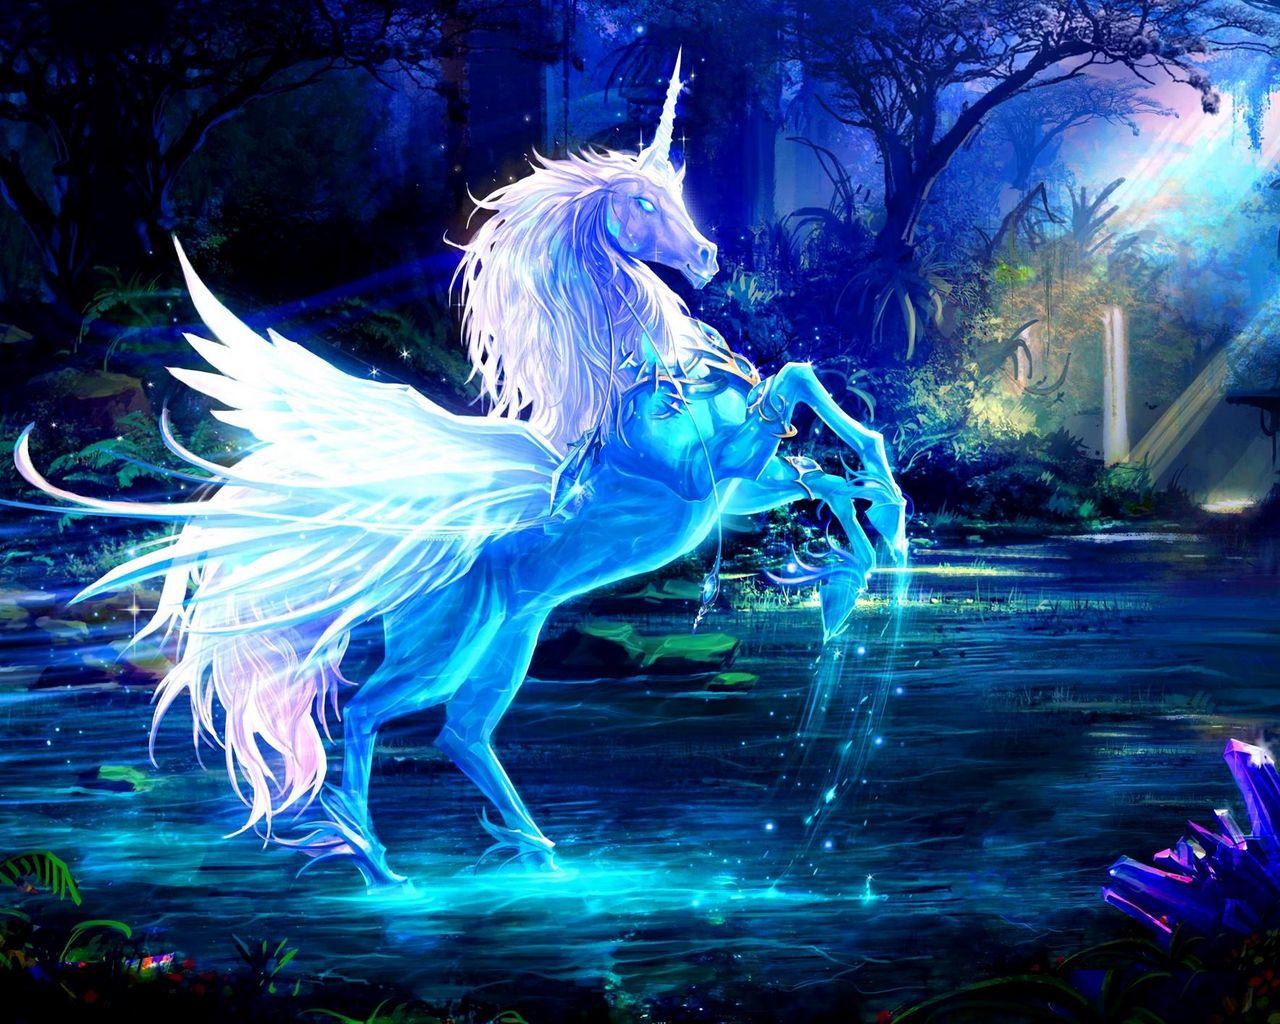 1280x1024 Wallpaper unicorn, water, forest, night, magic